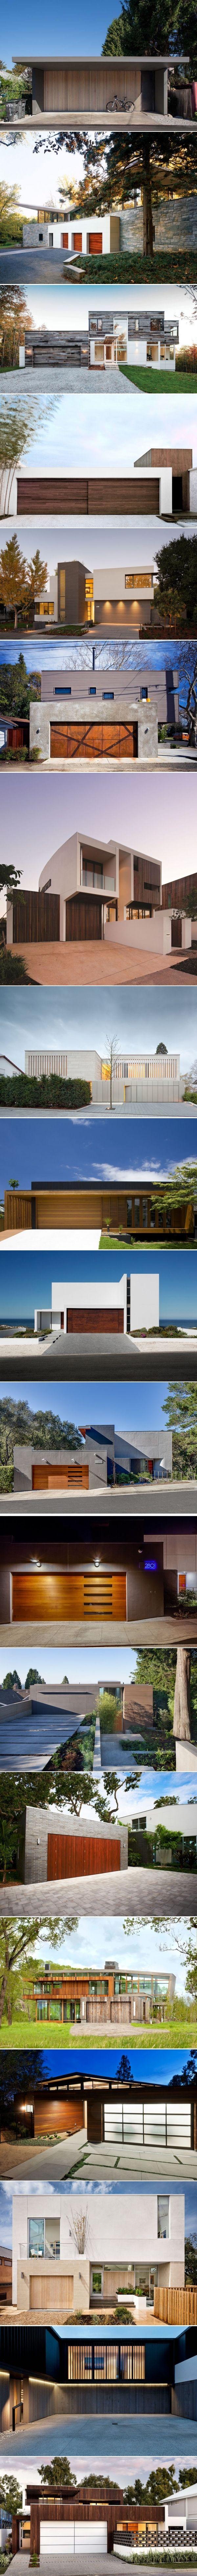 faux wagen garagentore carriage 18 inspirational examples of modern garage doors contemporist architecture